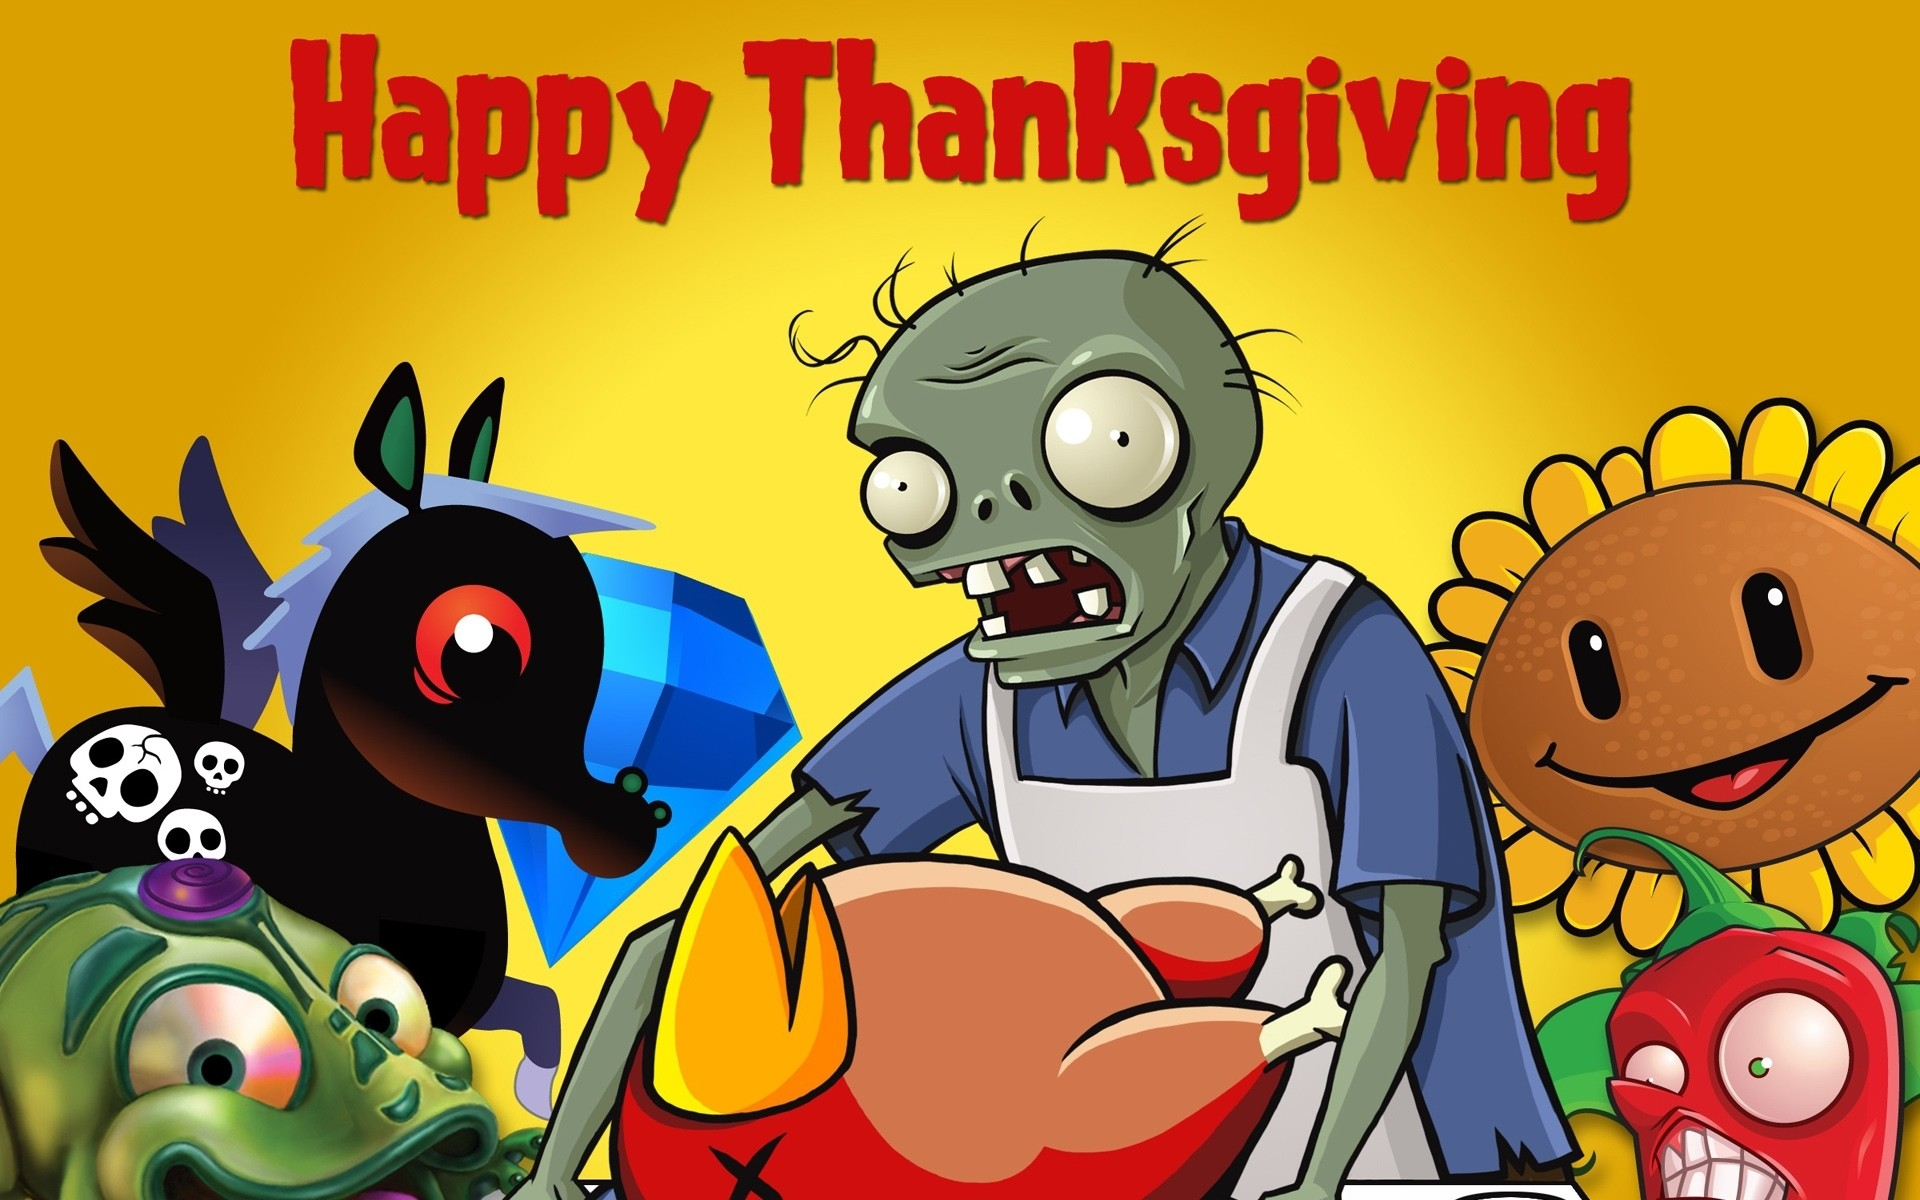 Animated Thanksgiving Desktop Wallpaper 60 images 1920x1200